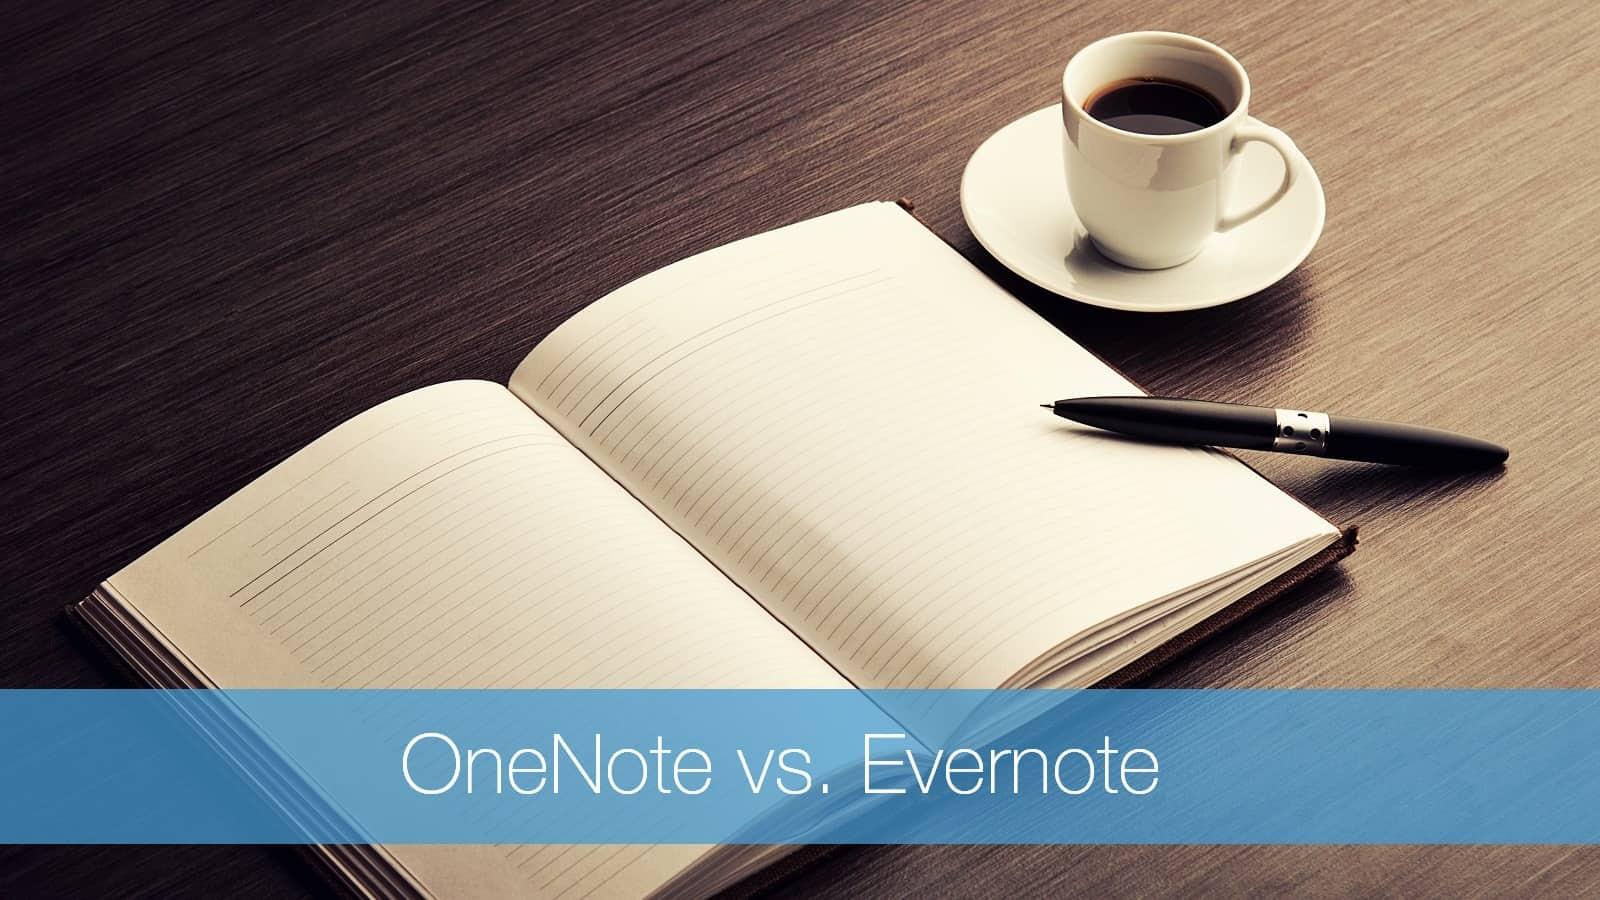 OneNote vs. Evernote